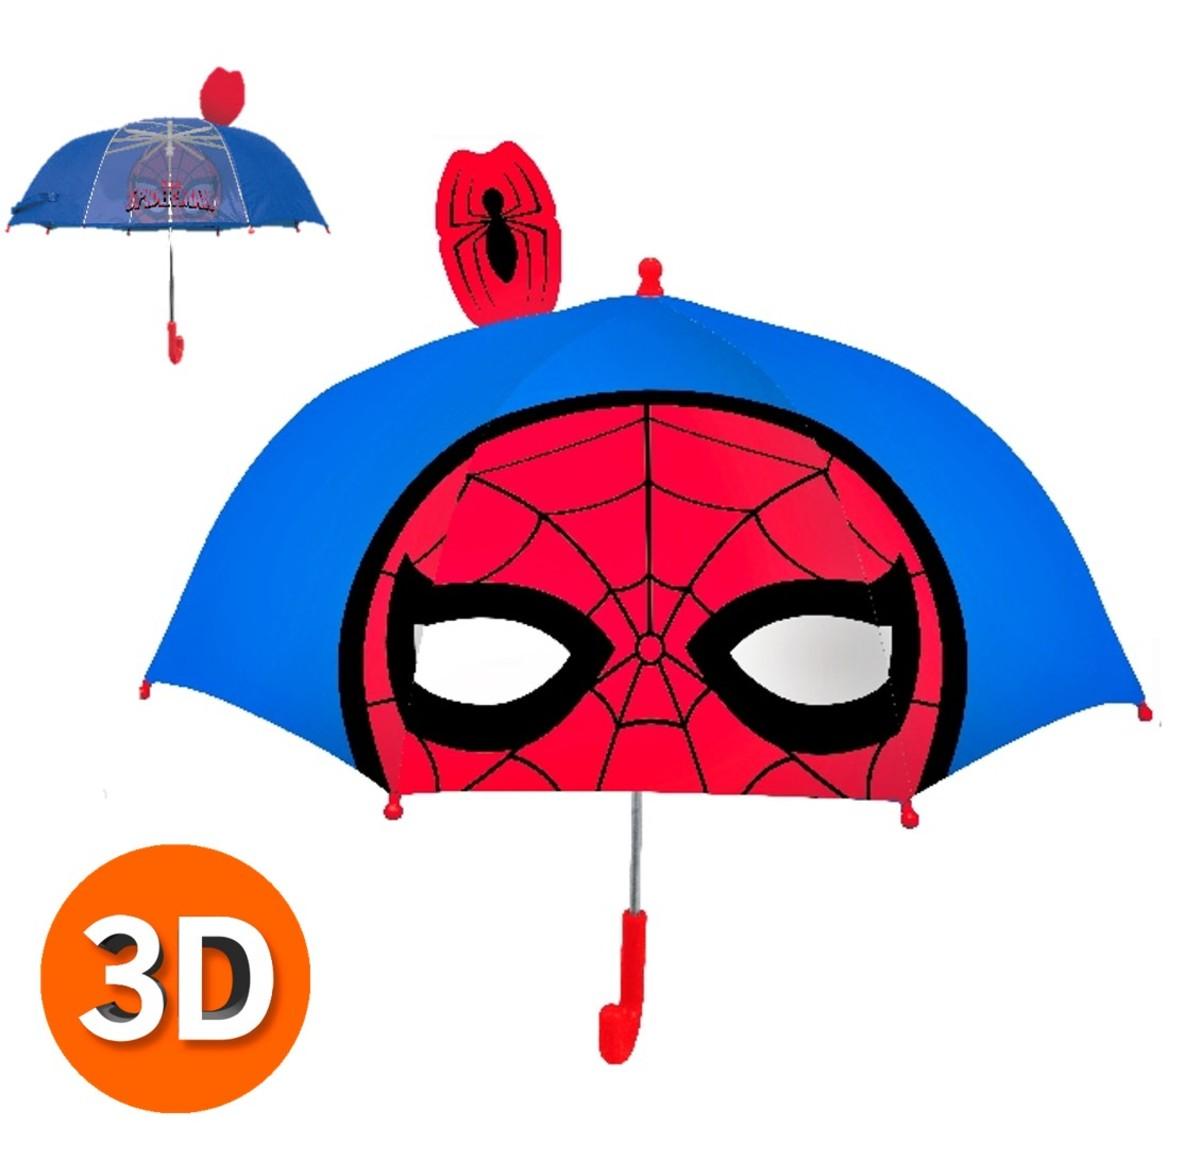 Disney-3D Umbrella B (Licensed by Disney)